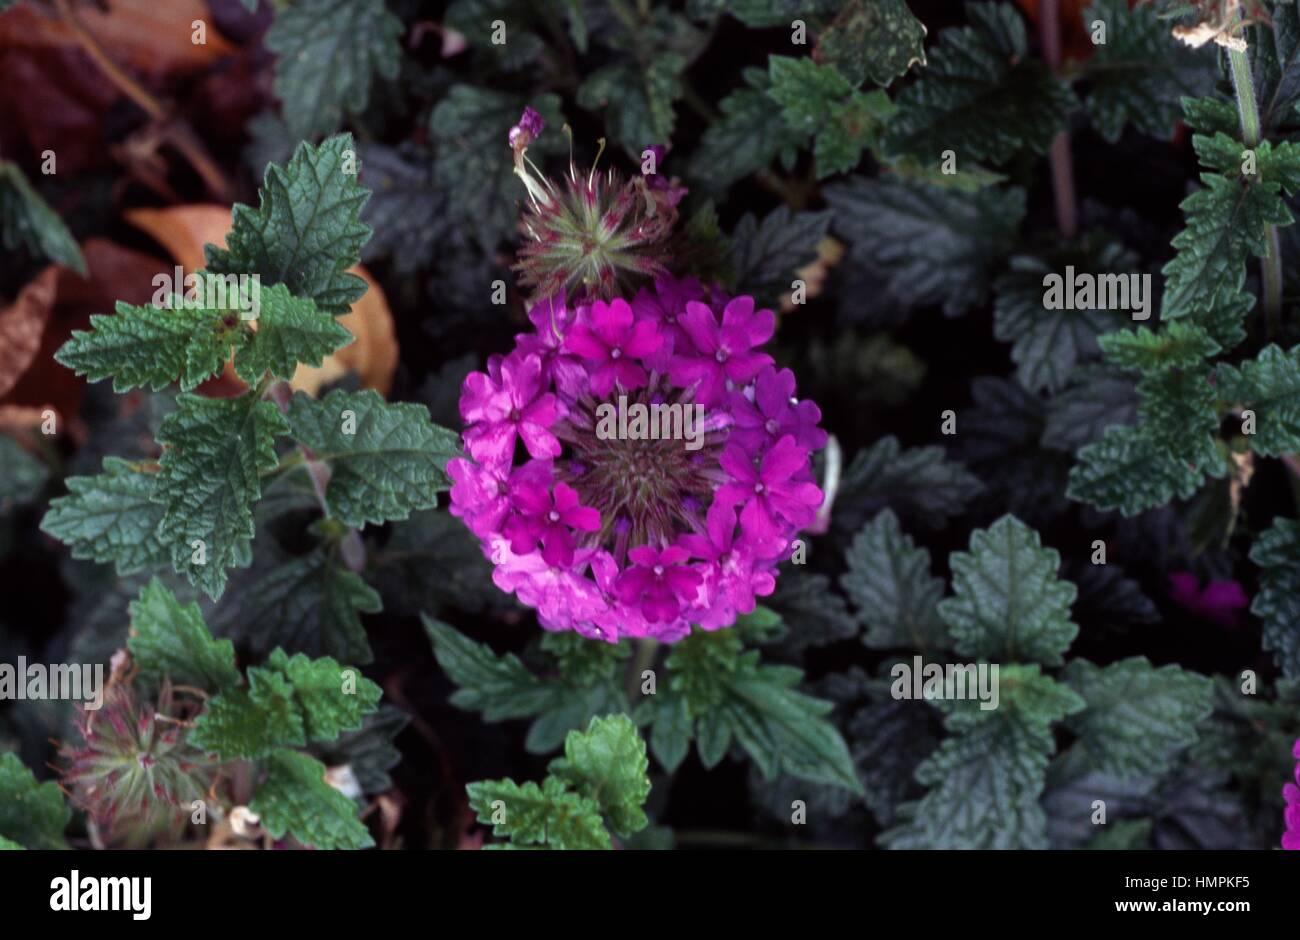 Homestead lila, Eisenkraut, Verbenaceae. Stockbild